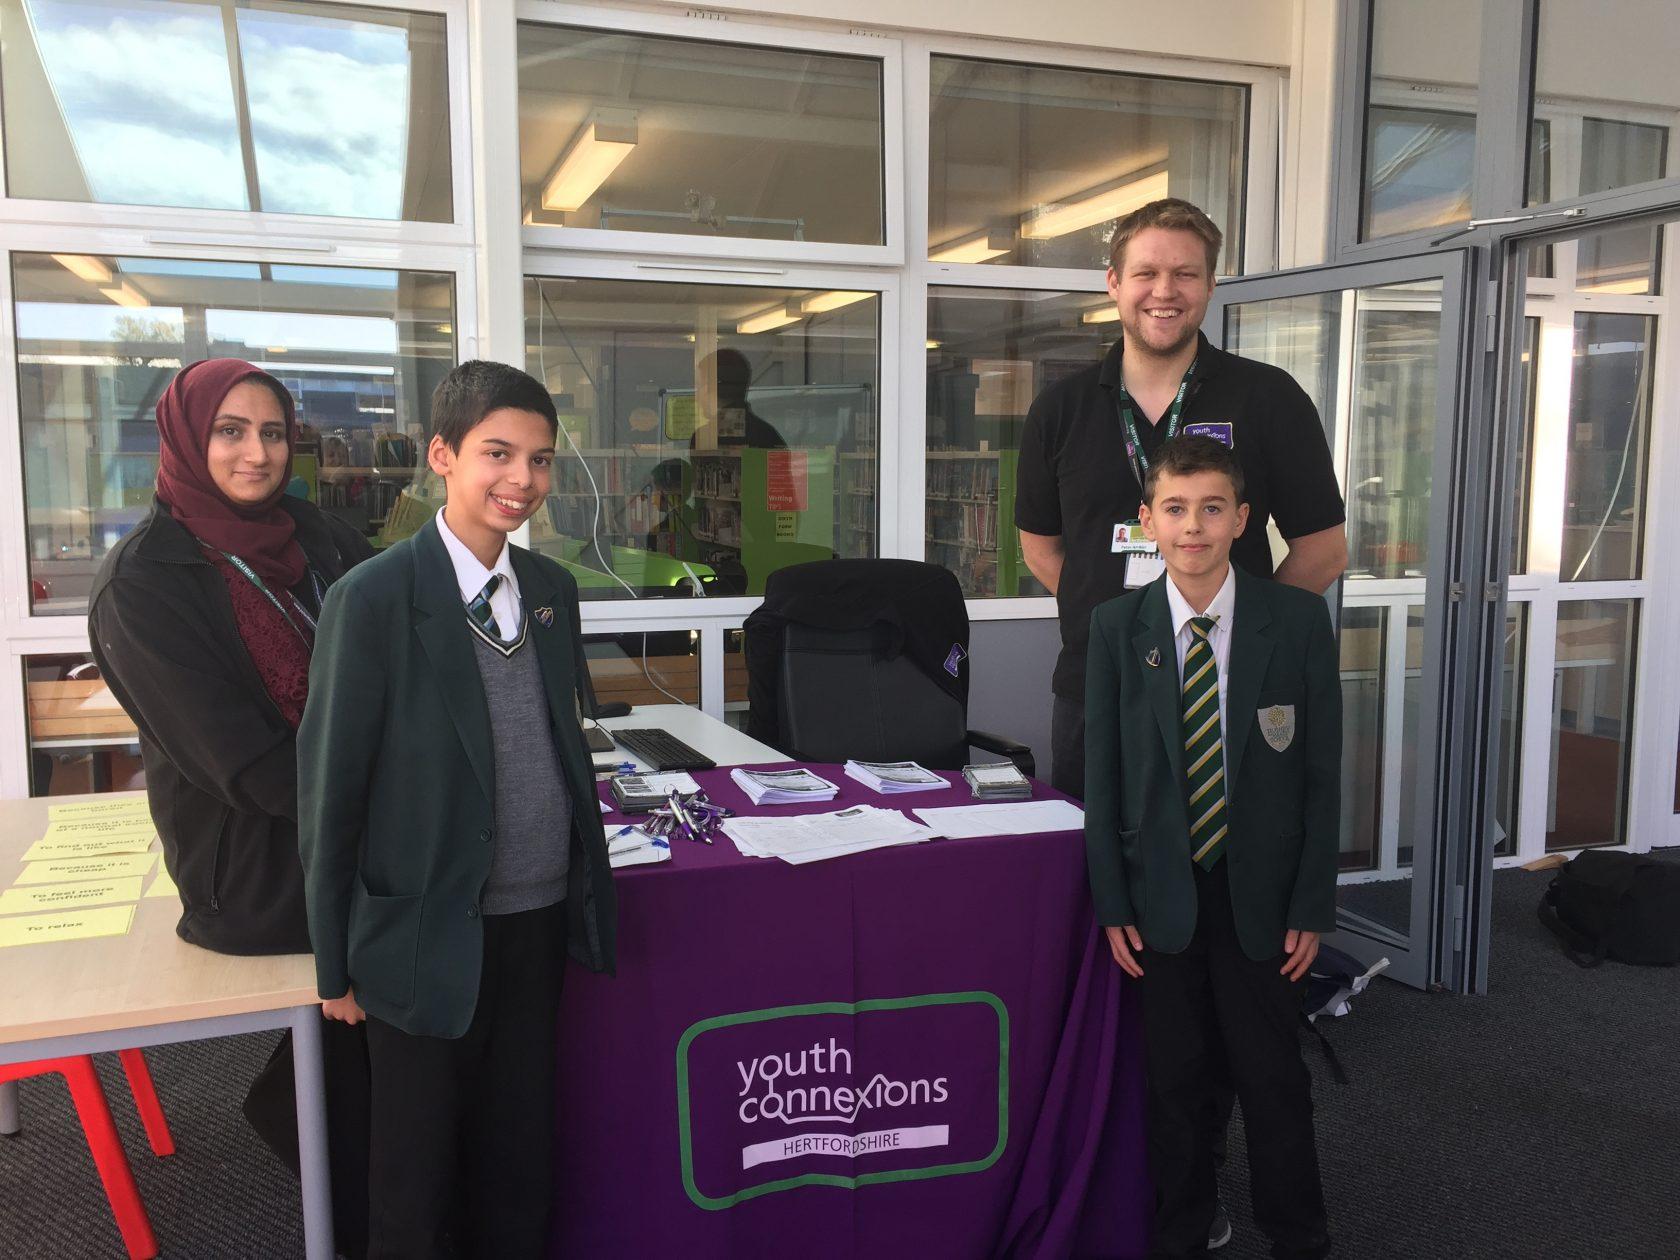 Bushey Meads celebrates Youth Week